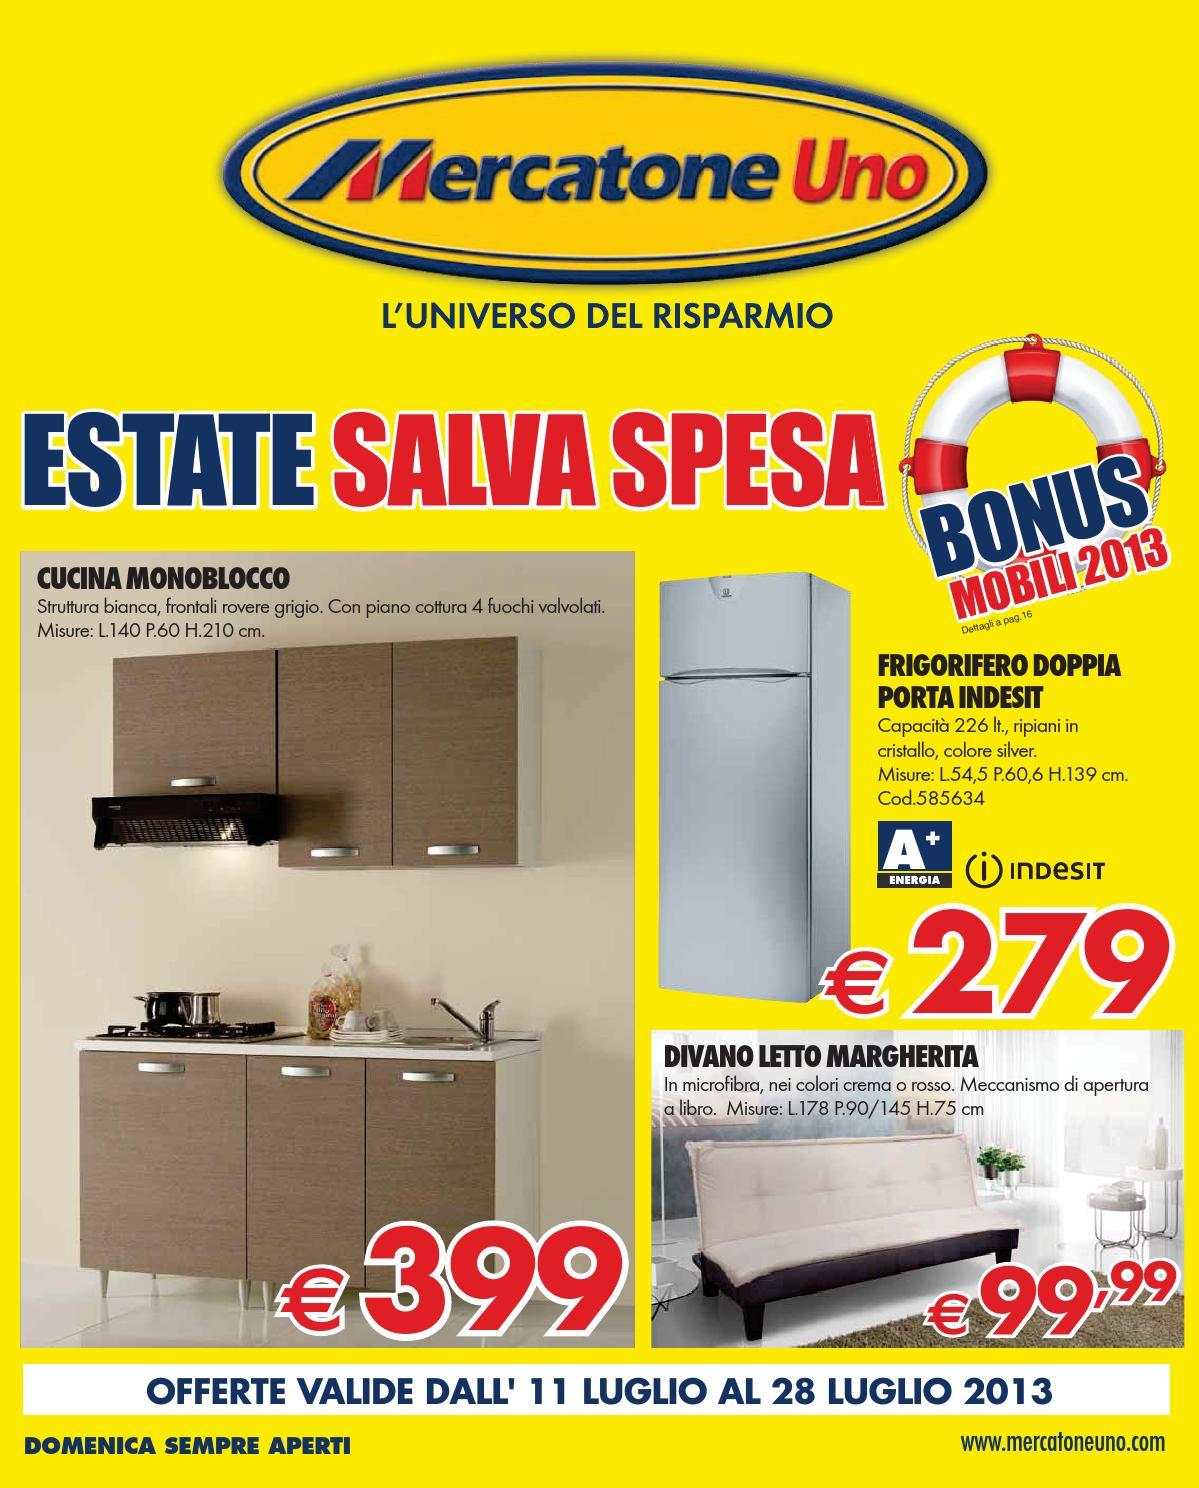 Mercatoneuno 28lug by fabrizio volante - issuu